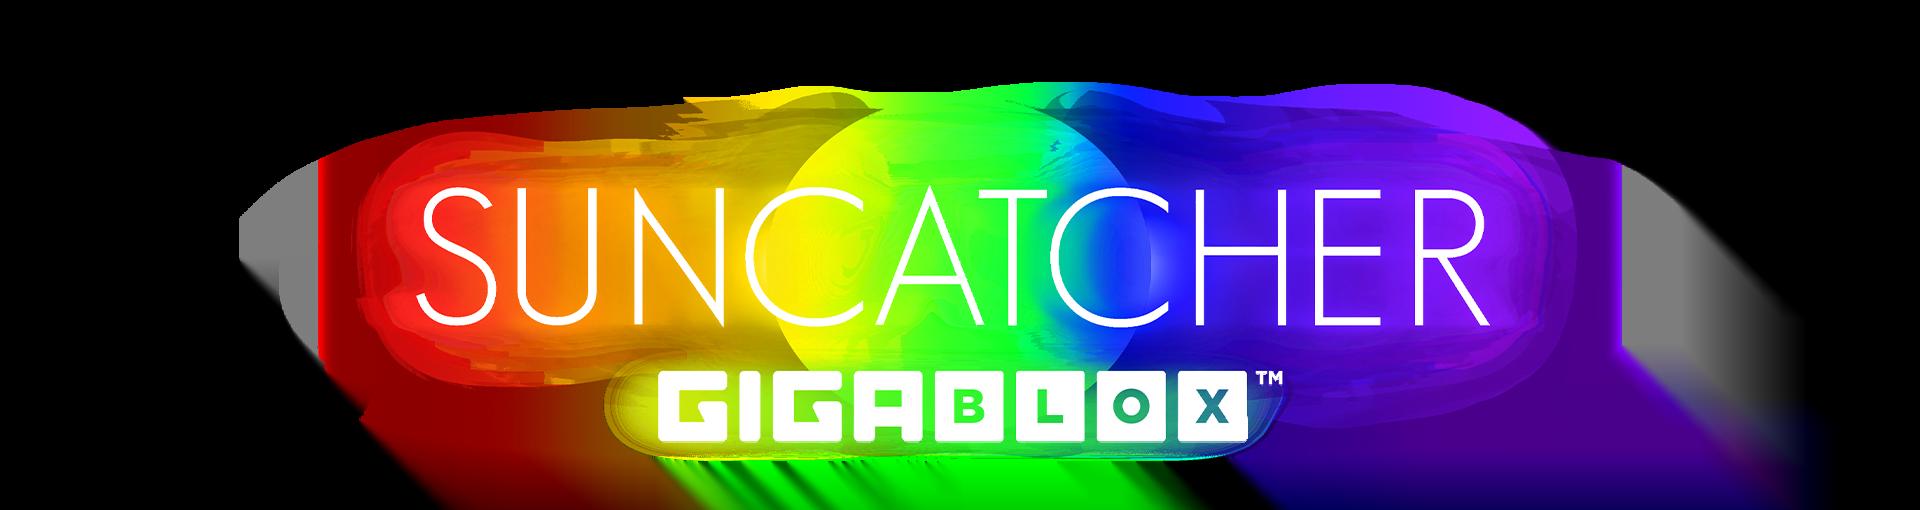 suncatcher_Yggdrasil-UpcomingGame-Logo-Template-1920x510px